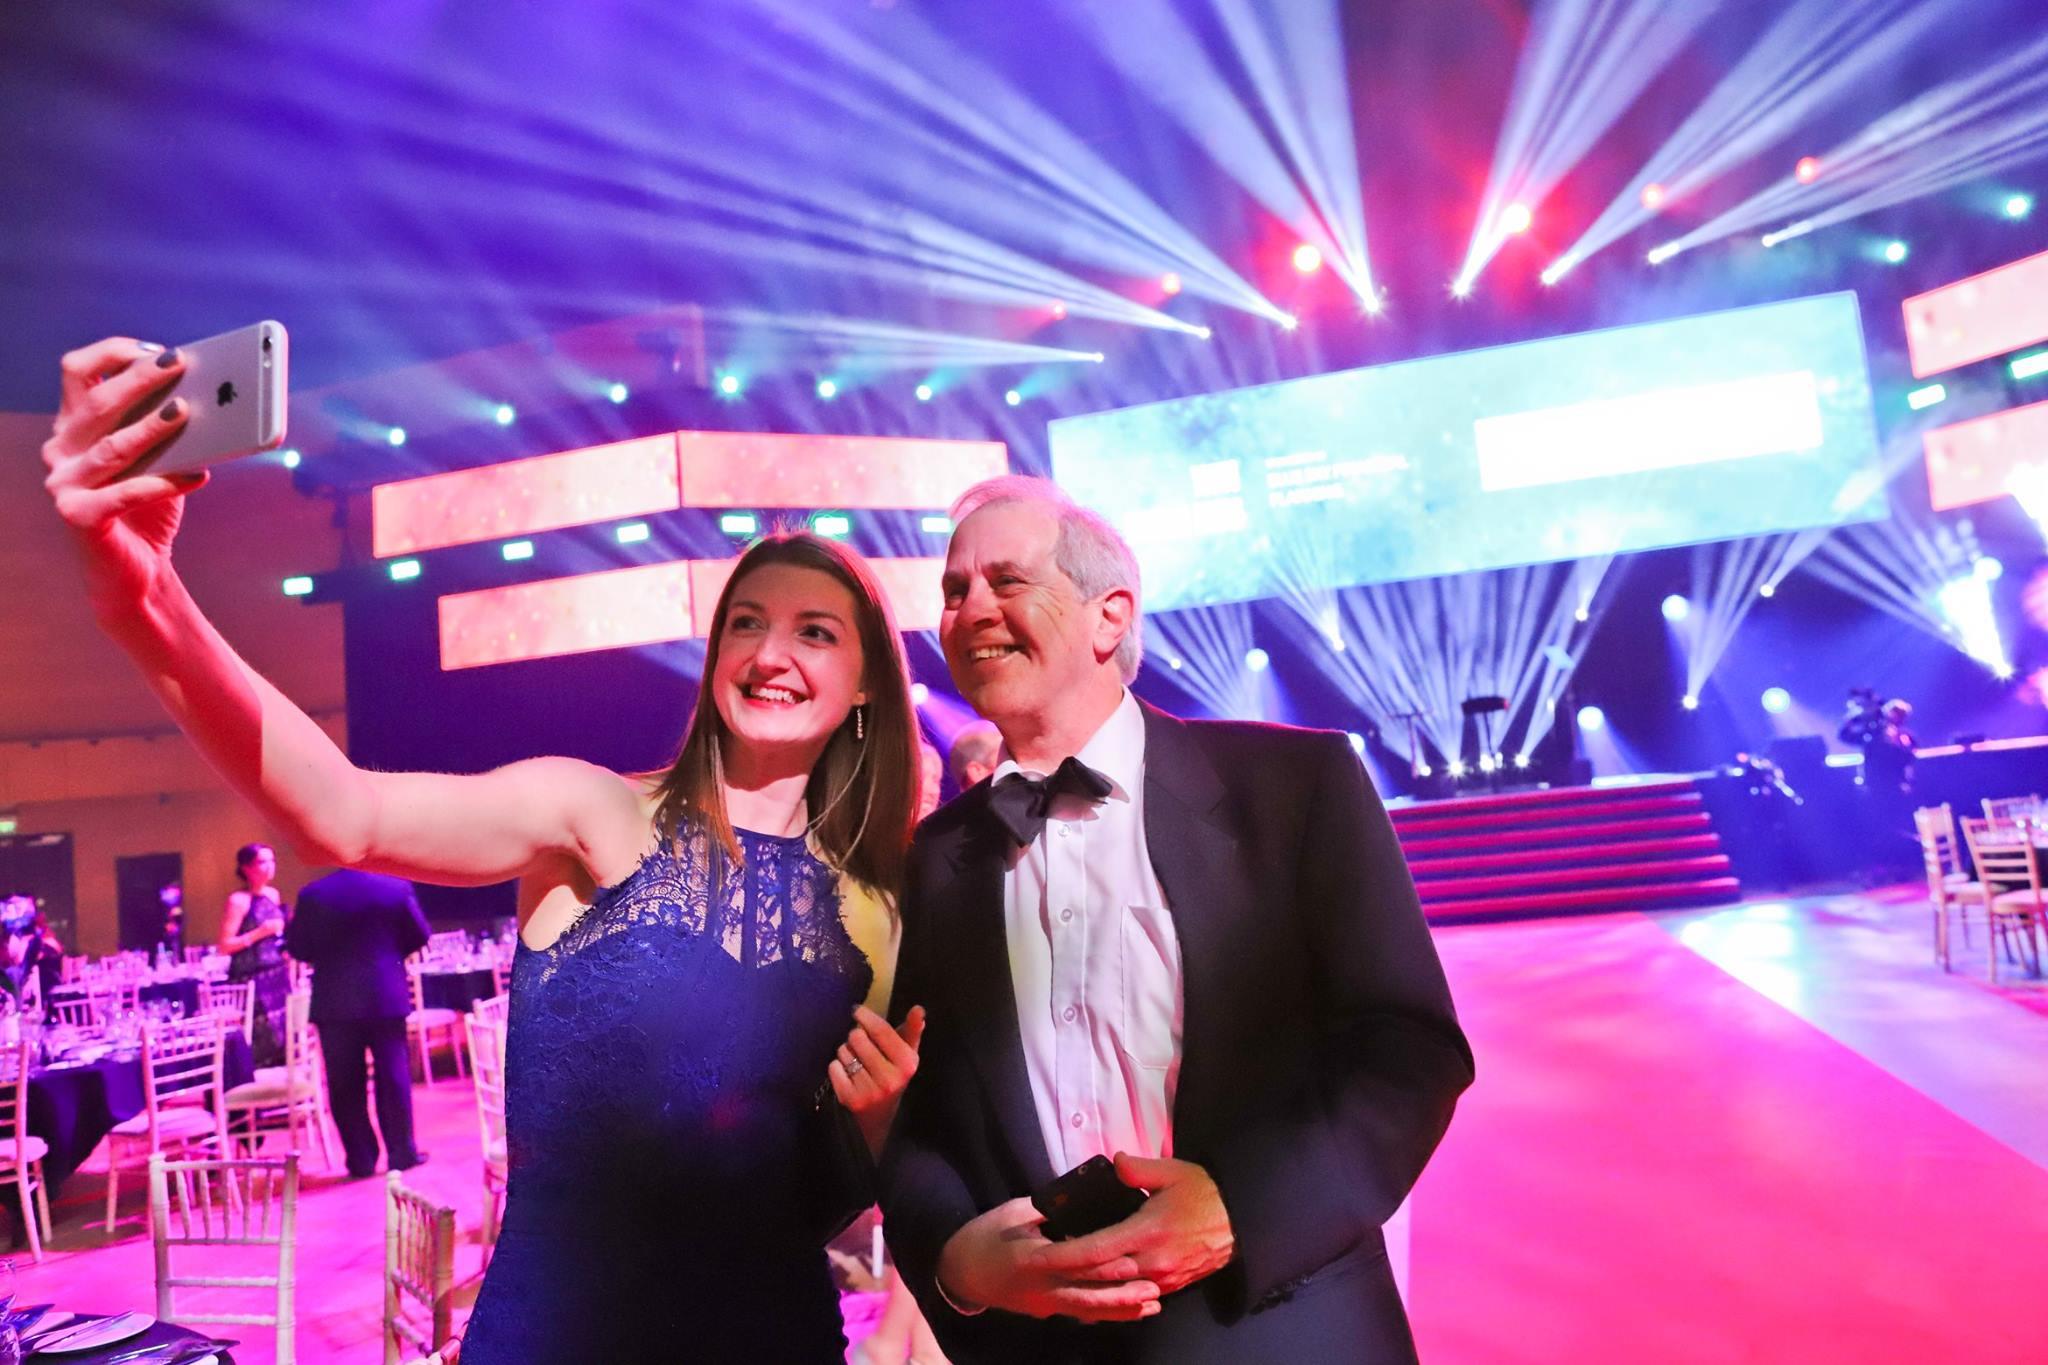 Dorset Business Awards